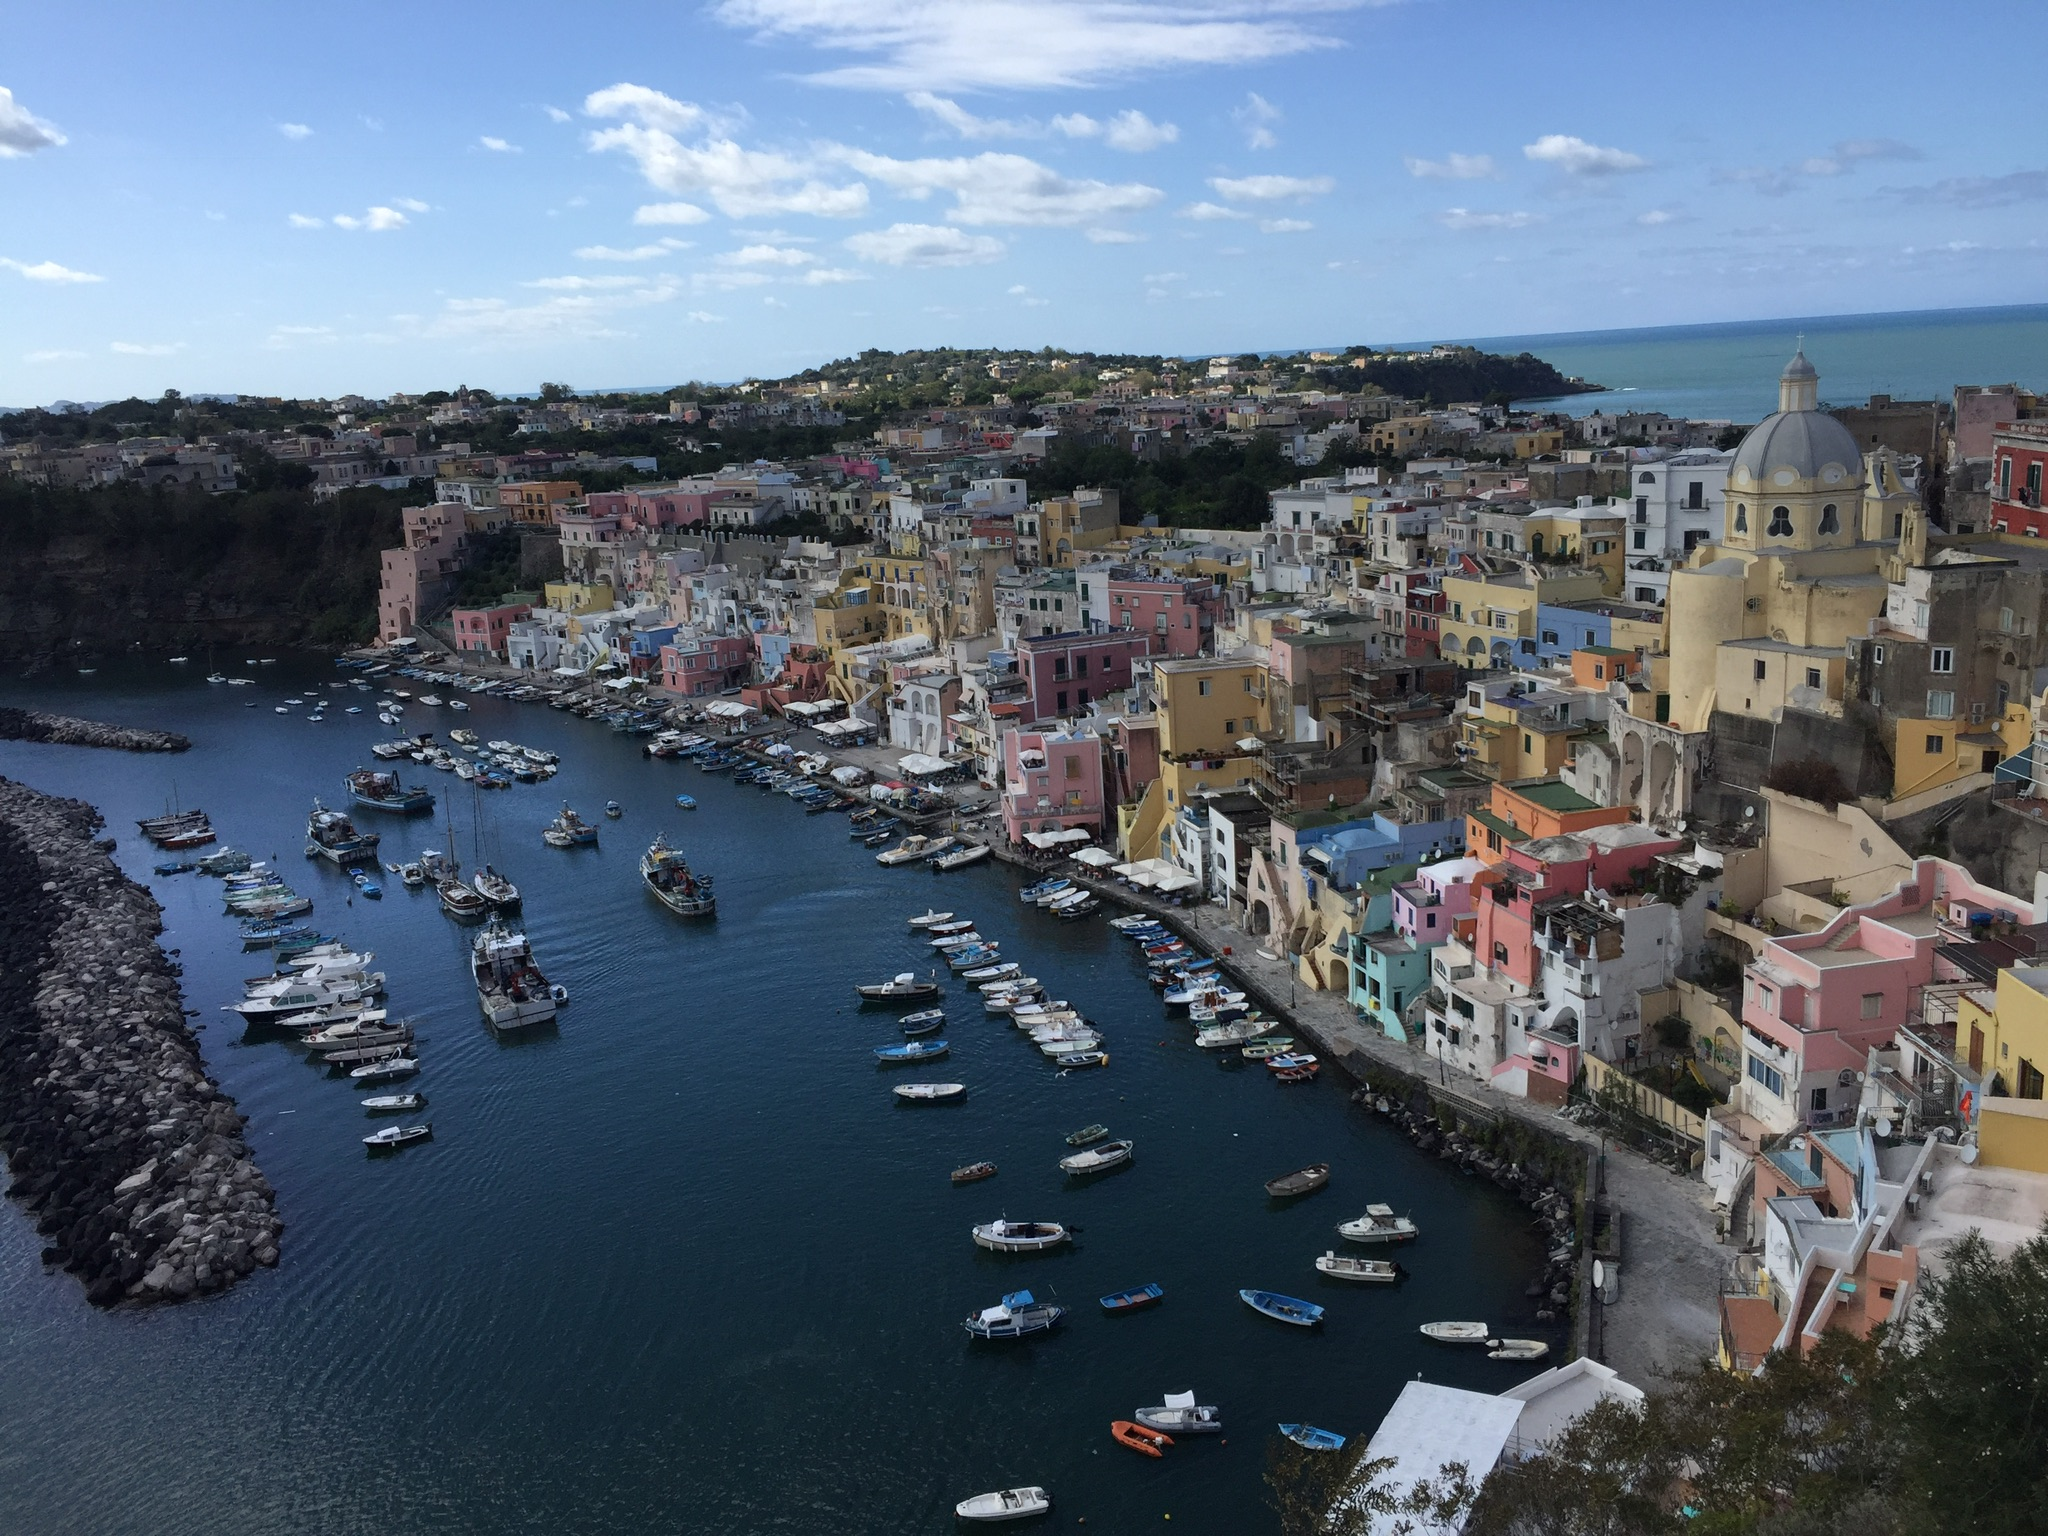 Sehenswert in der Region Kampanien: Die Insel Procida